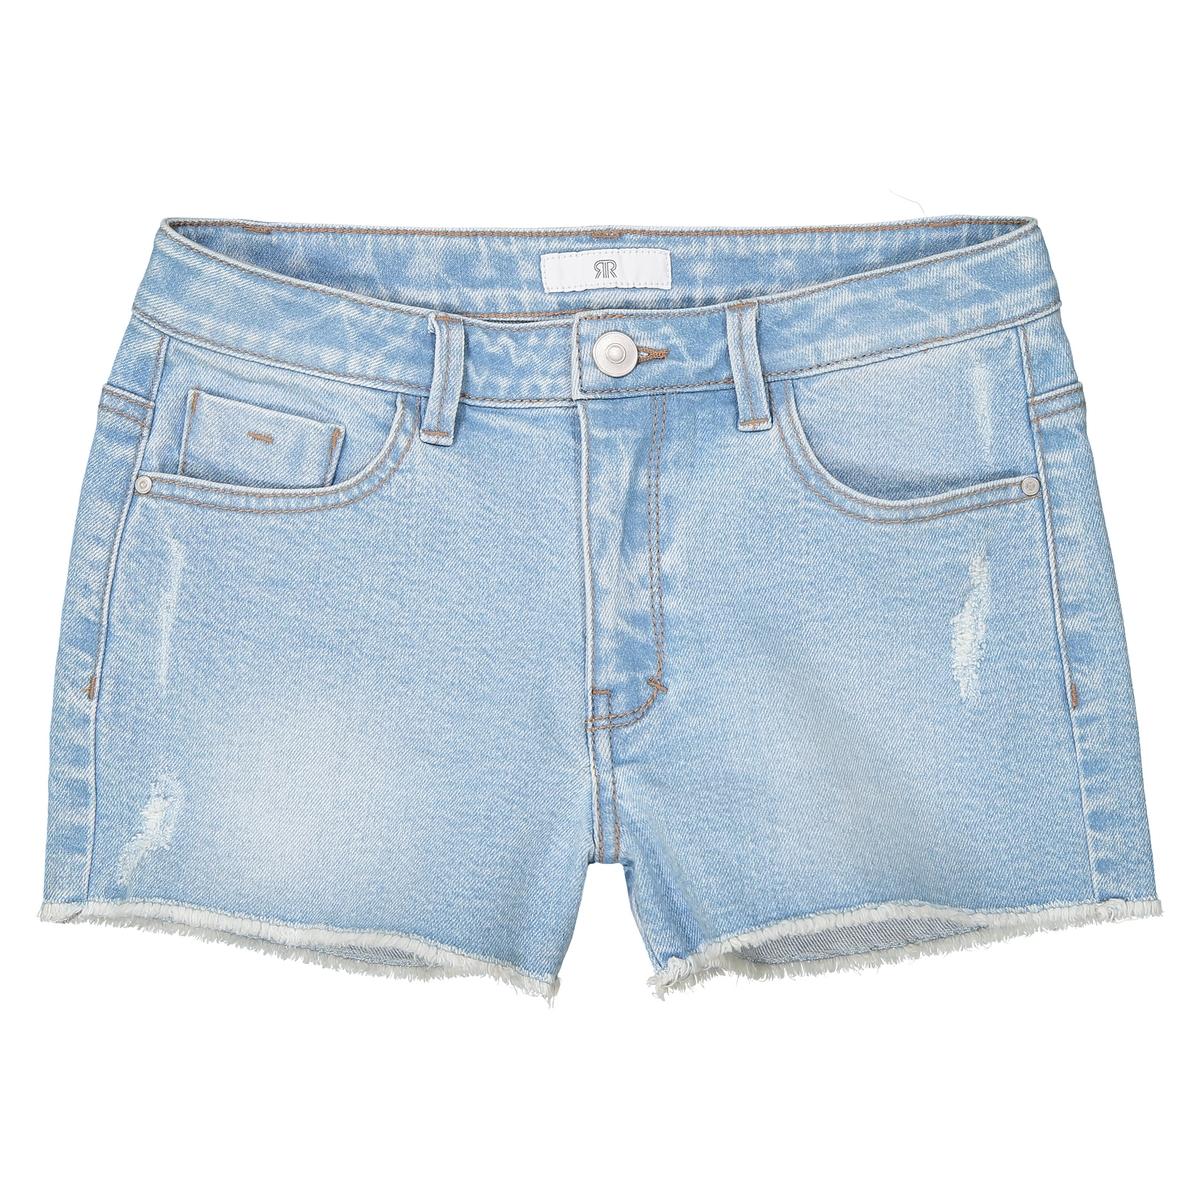 Shorts in denim destroy da 10 a 16 anni